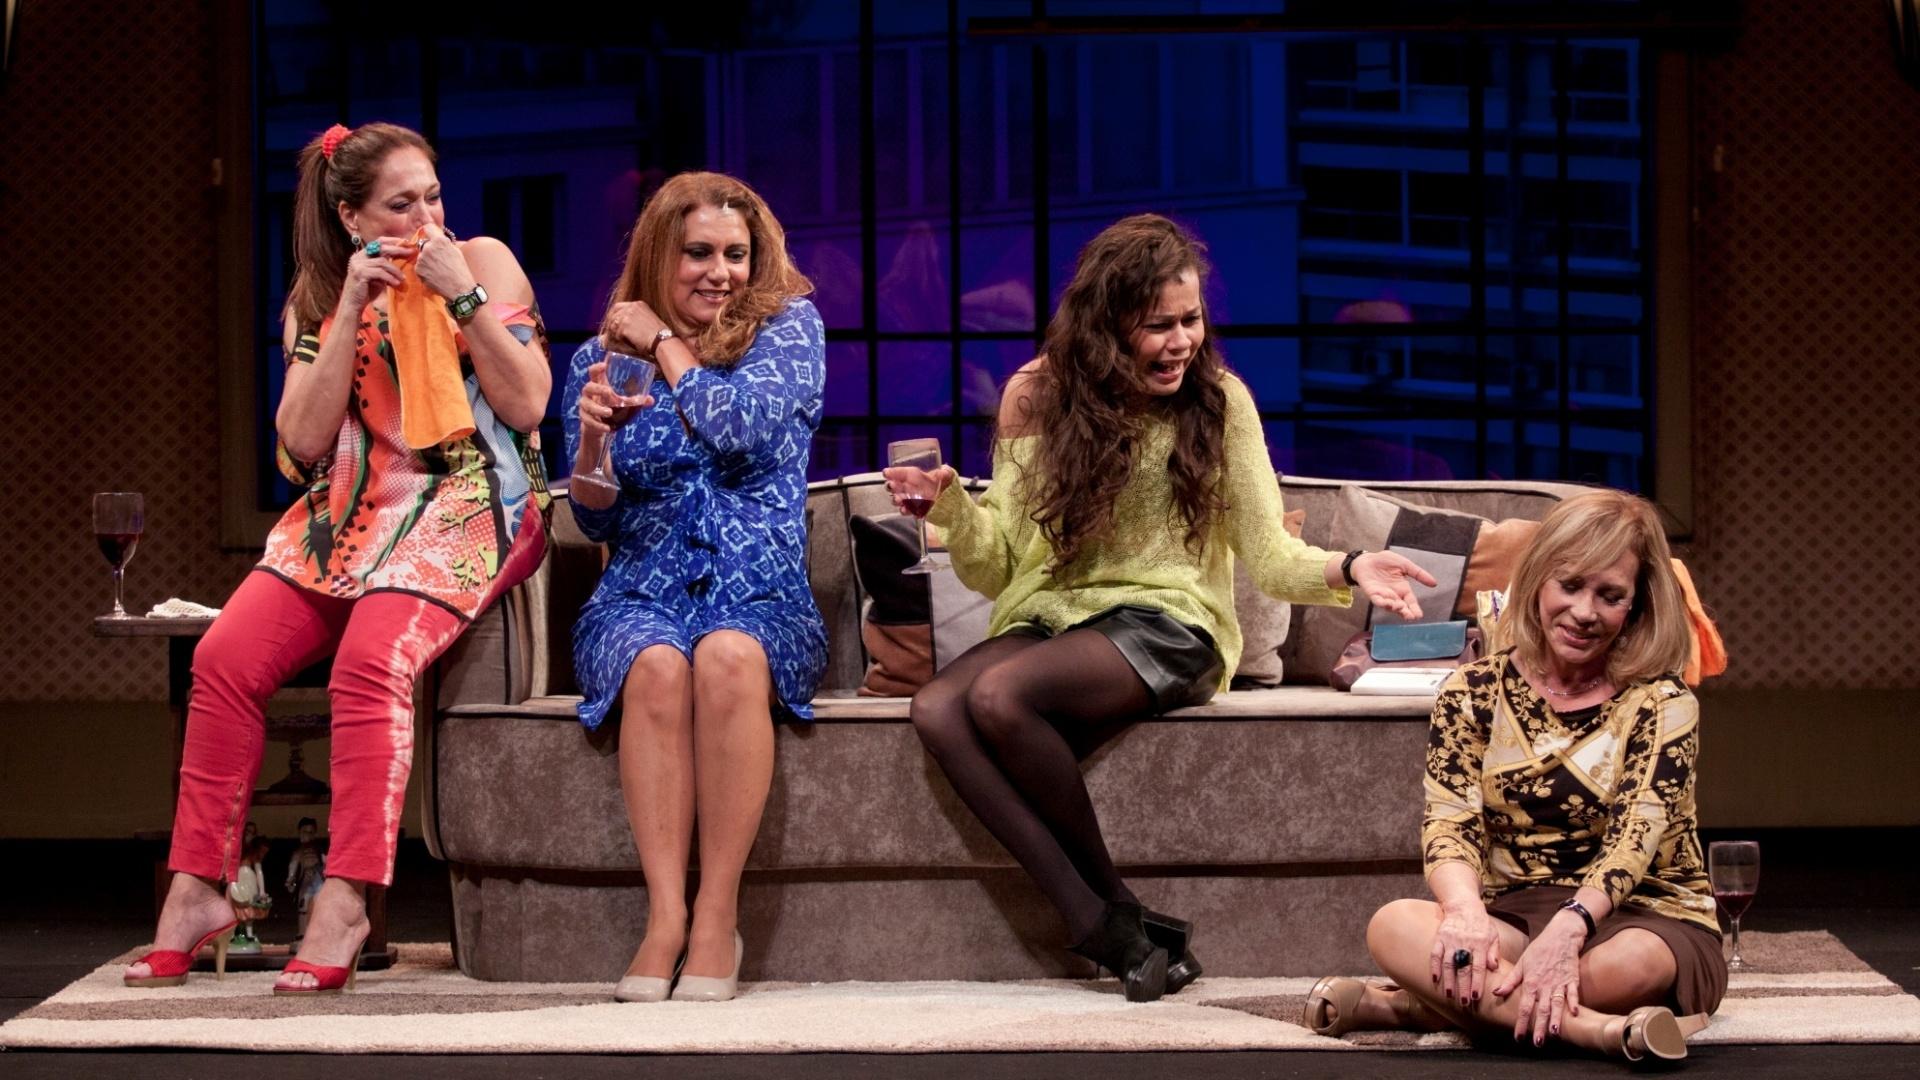 Susana Viera, Patrícya Travassos, Thereza Piffer e Arlete Salles na peça